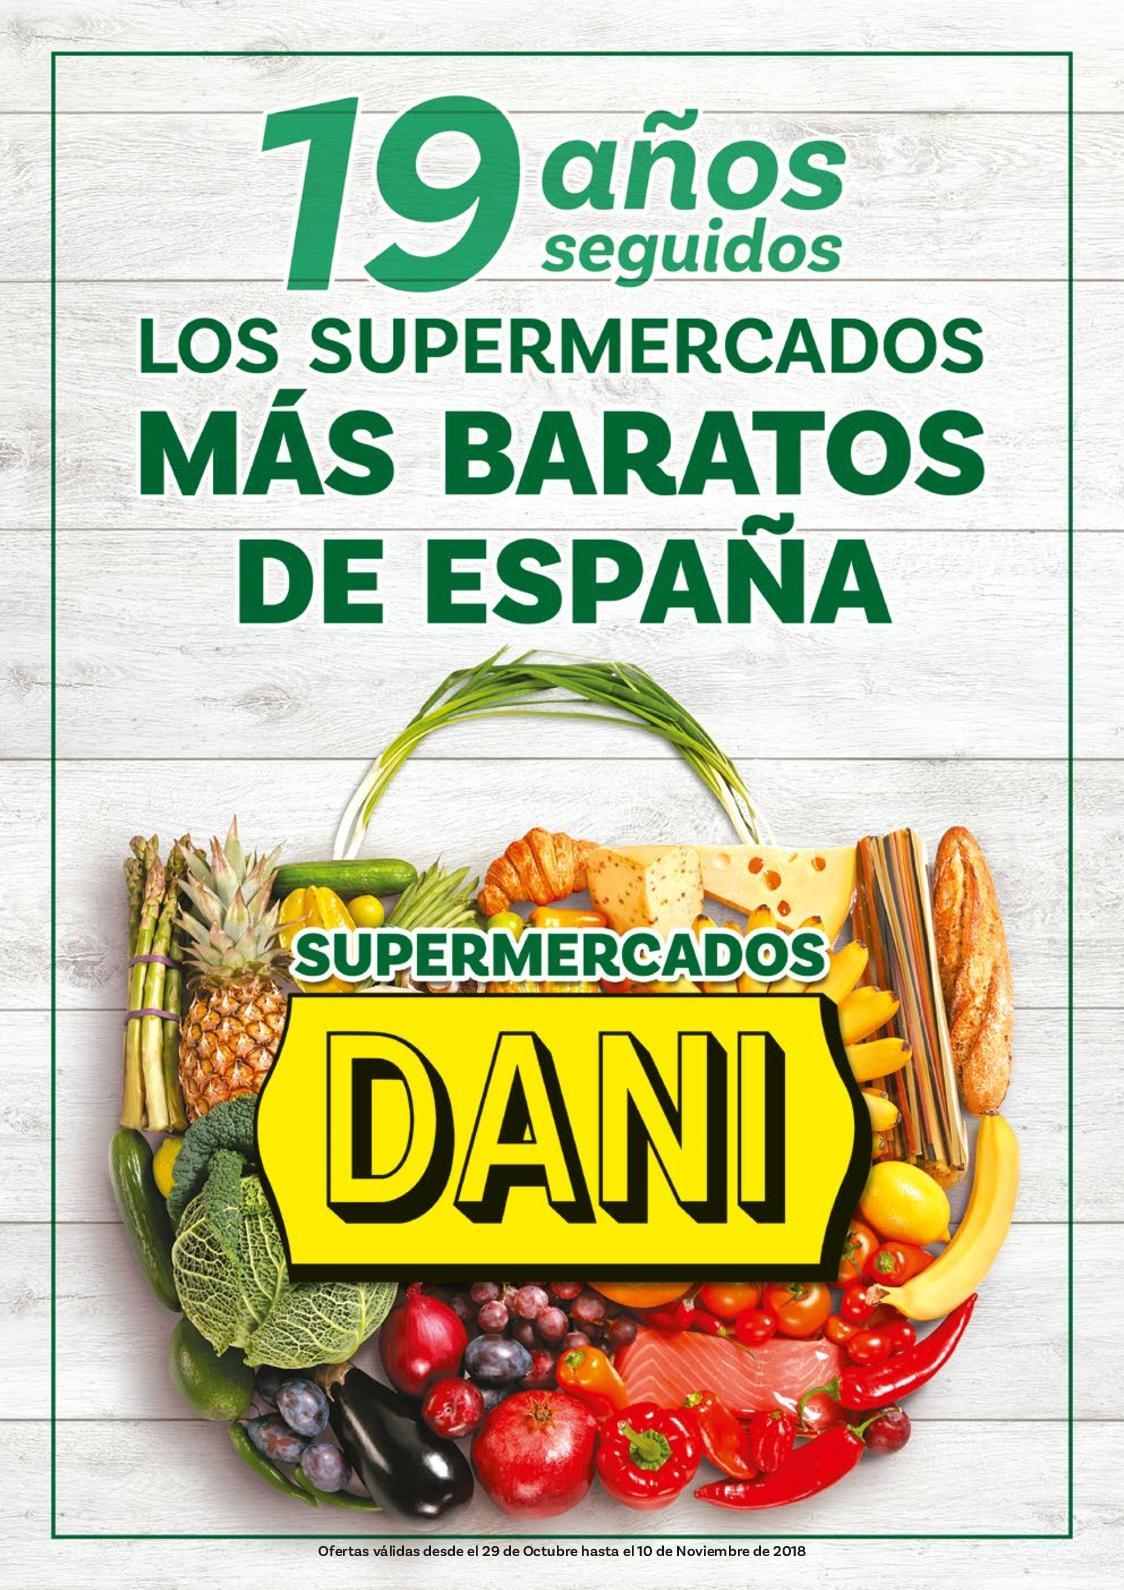 Dani Folleto Calaméo Dani Supermercados Supermercados Folleto Supermercados Calaméo Folleto Calaméo CtshQrd